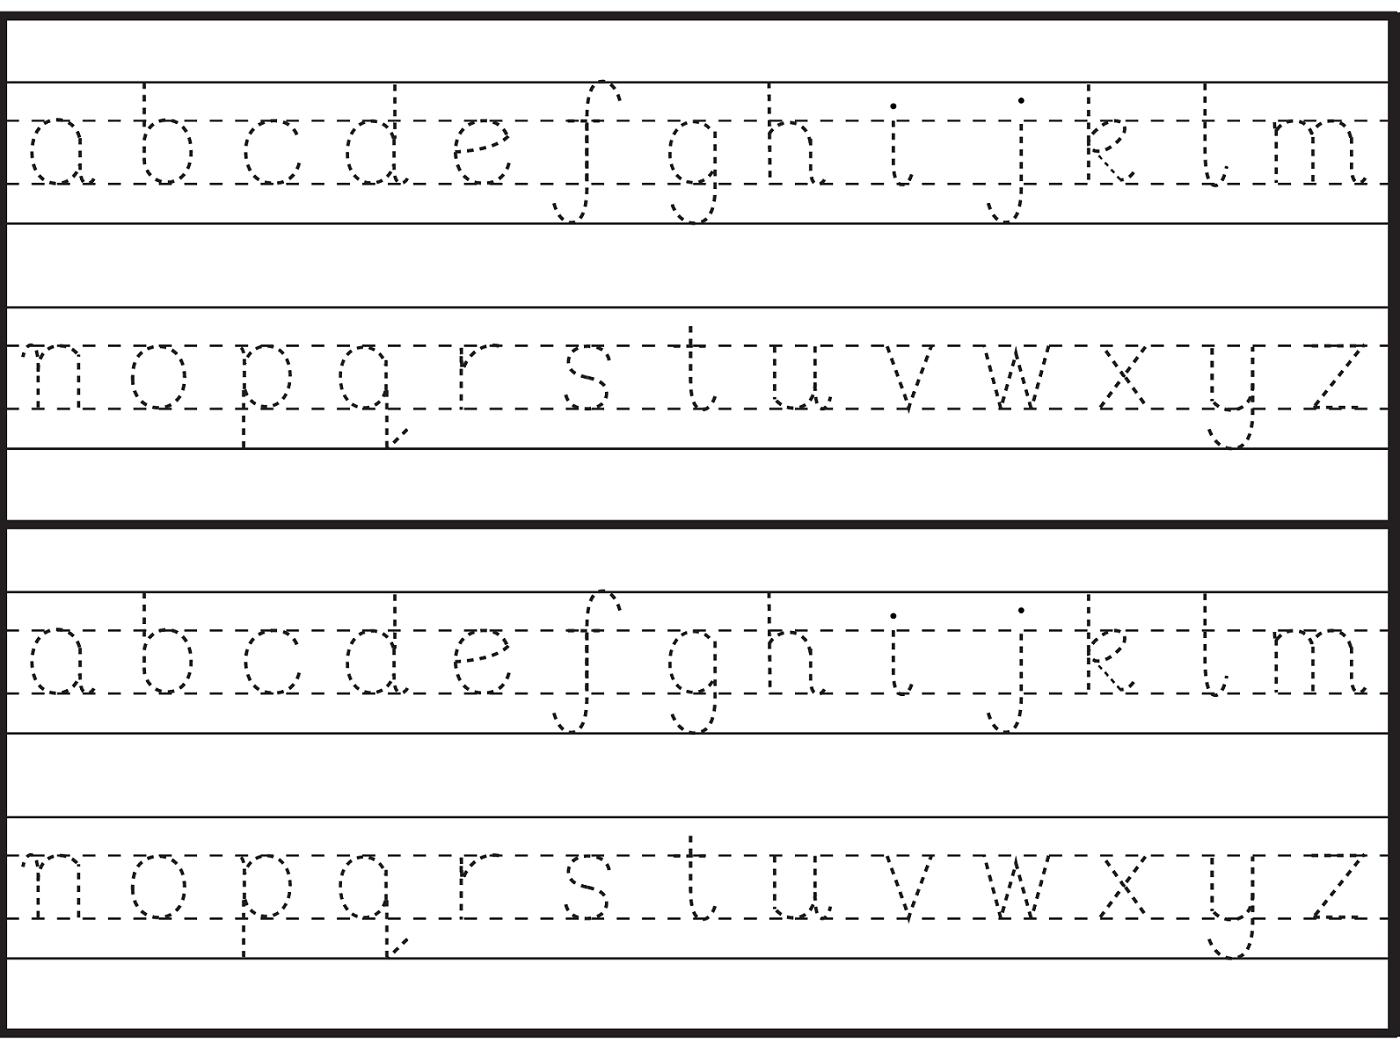 English Alphabet Worksheet For Kindergarten | Handwriting with regard to Alphabet Worksheets In English